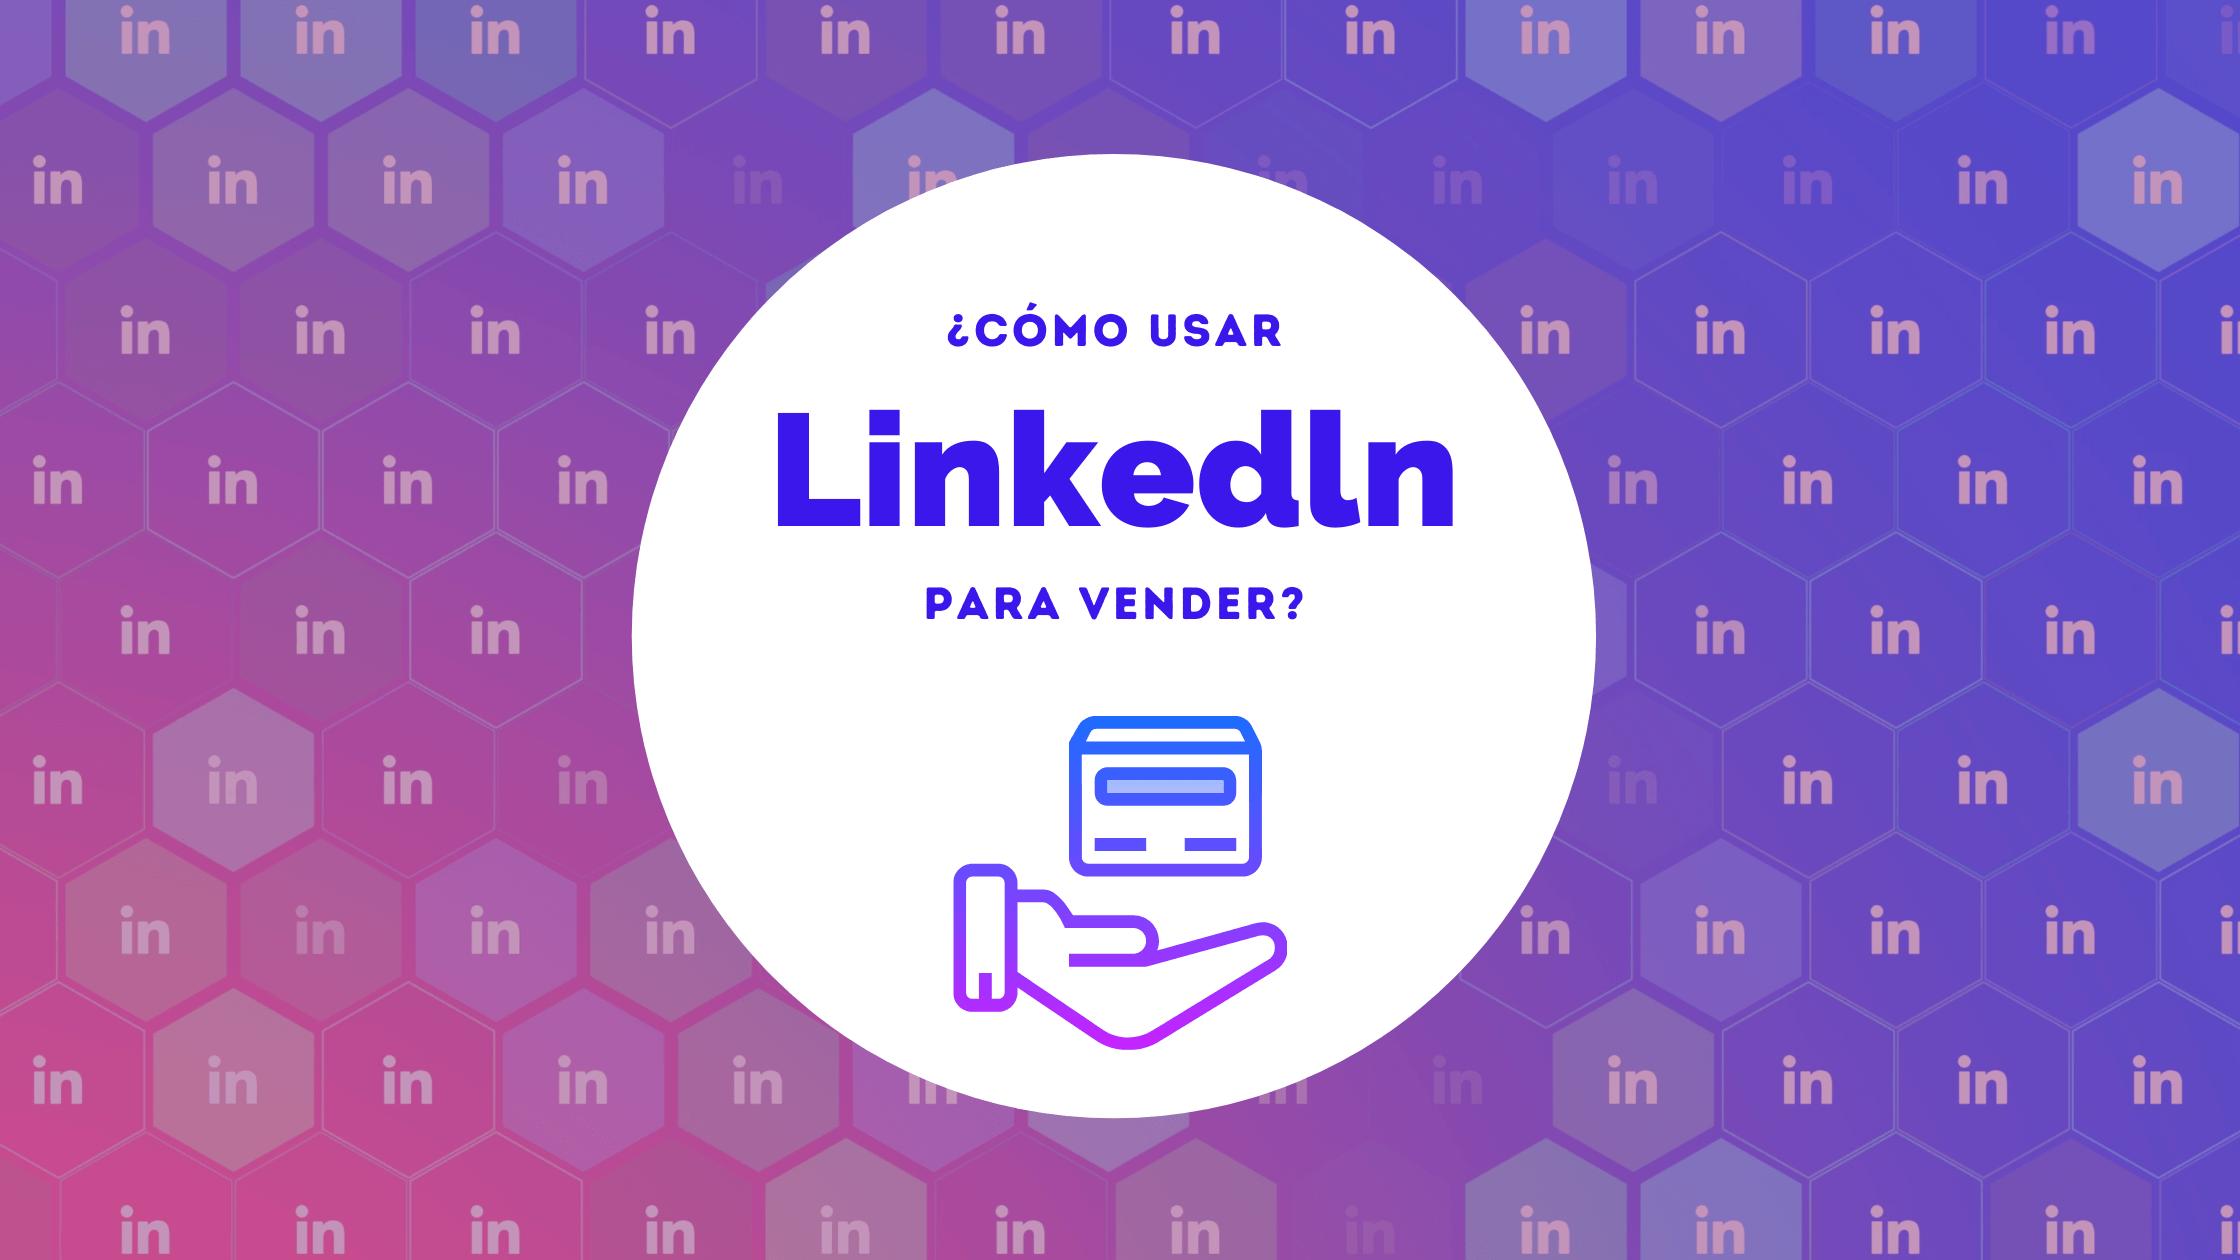 ¿Cómo usar Linkedln para vender?